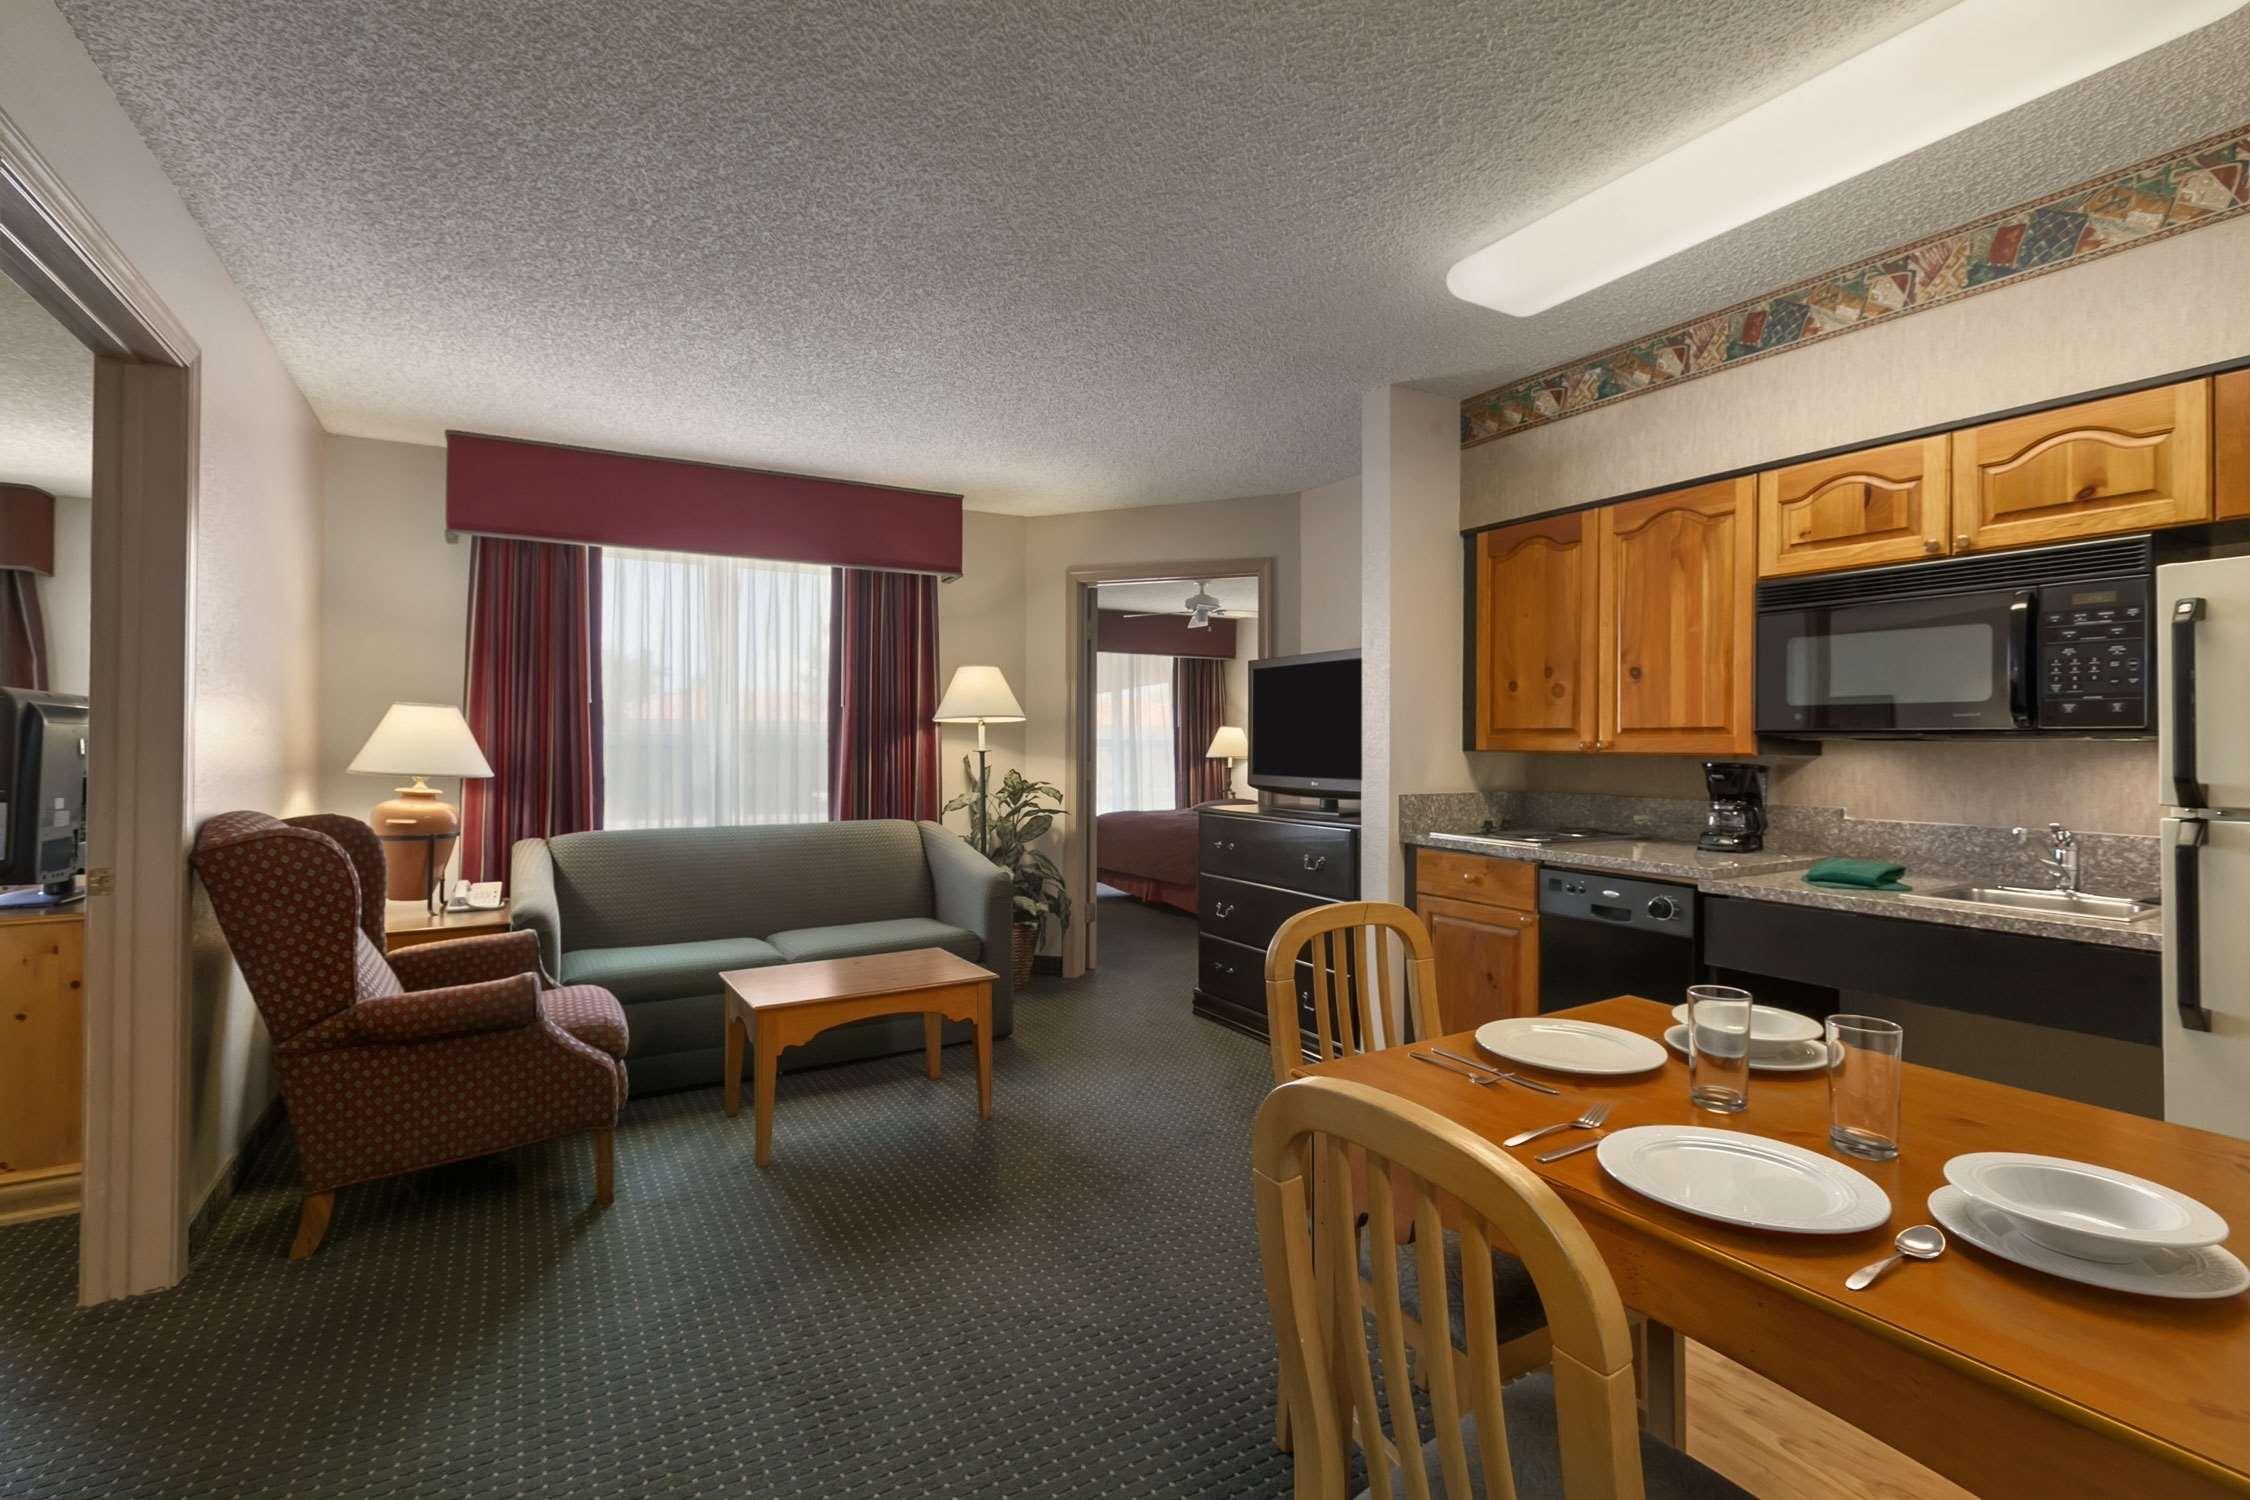 Homewood Suites by Hilton Phoenix/Scottsdale image 13